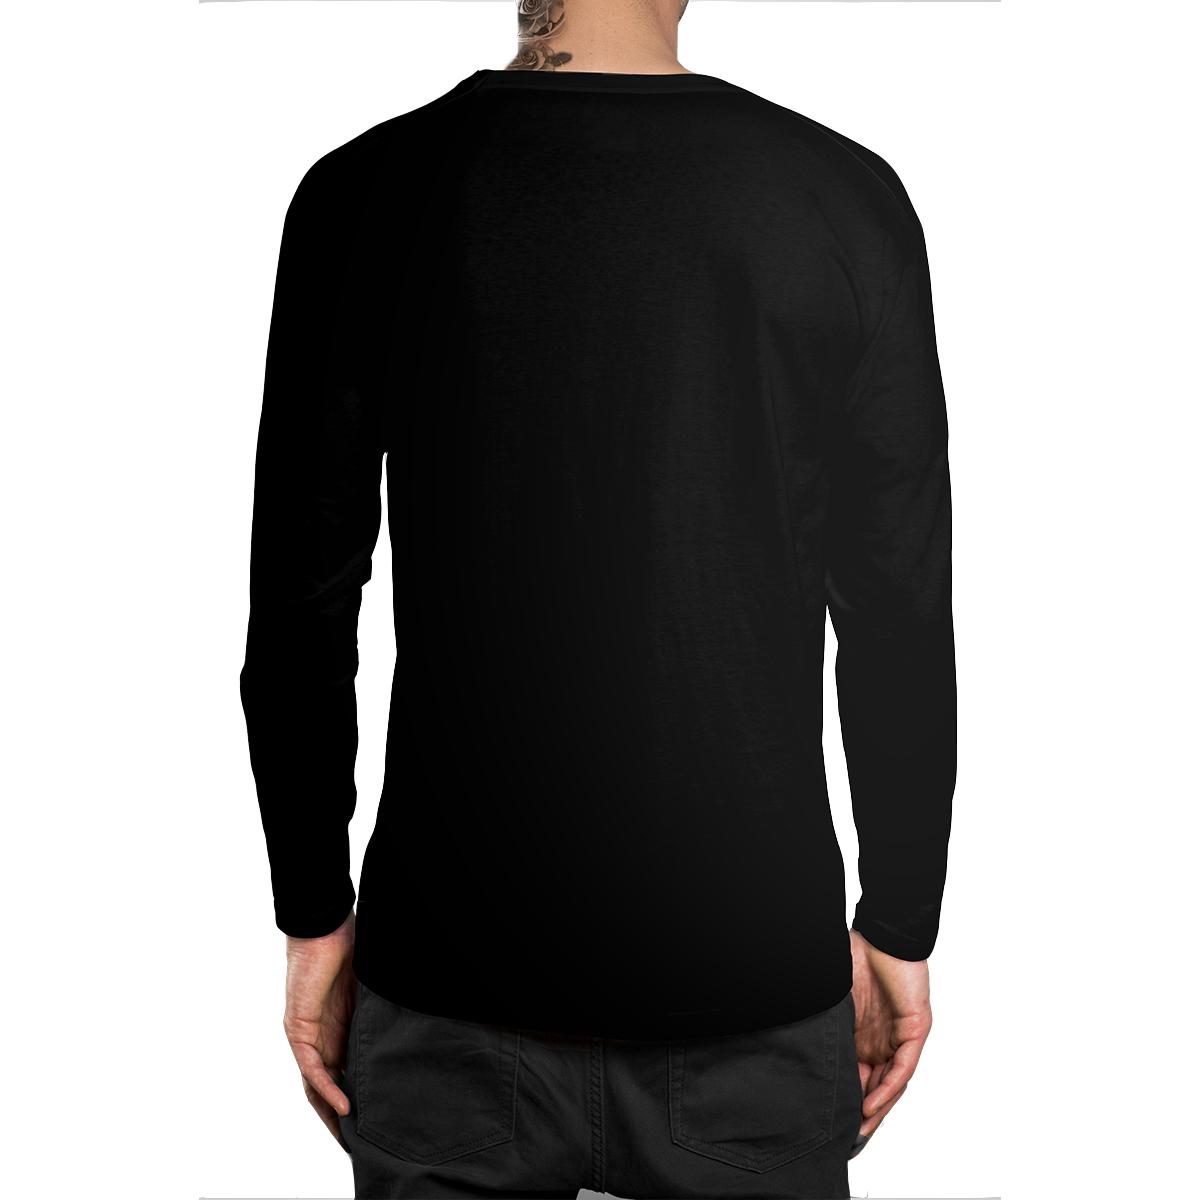 Stompy Camiseta Manga Longa Modelo 51